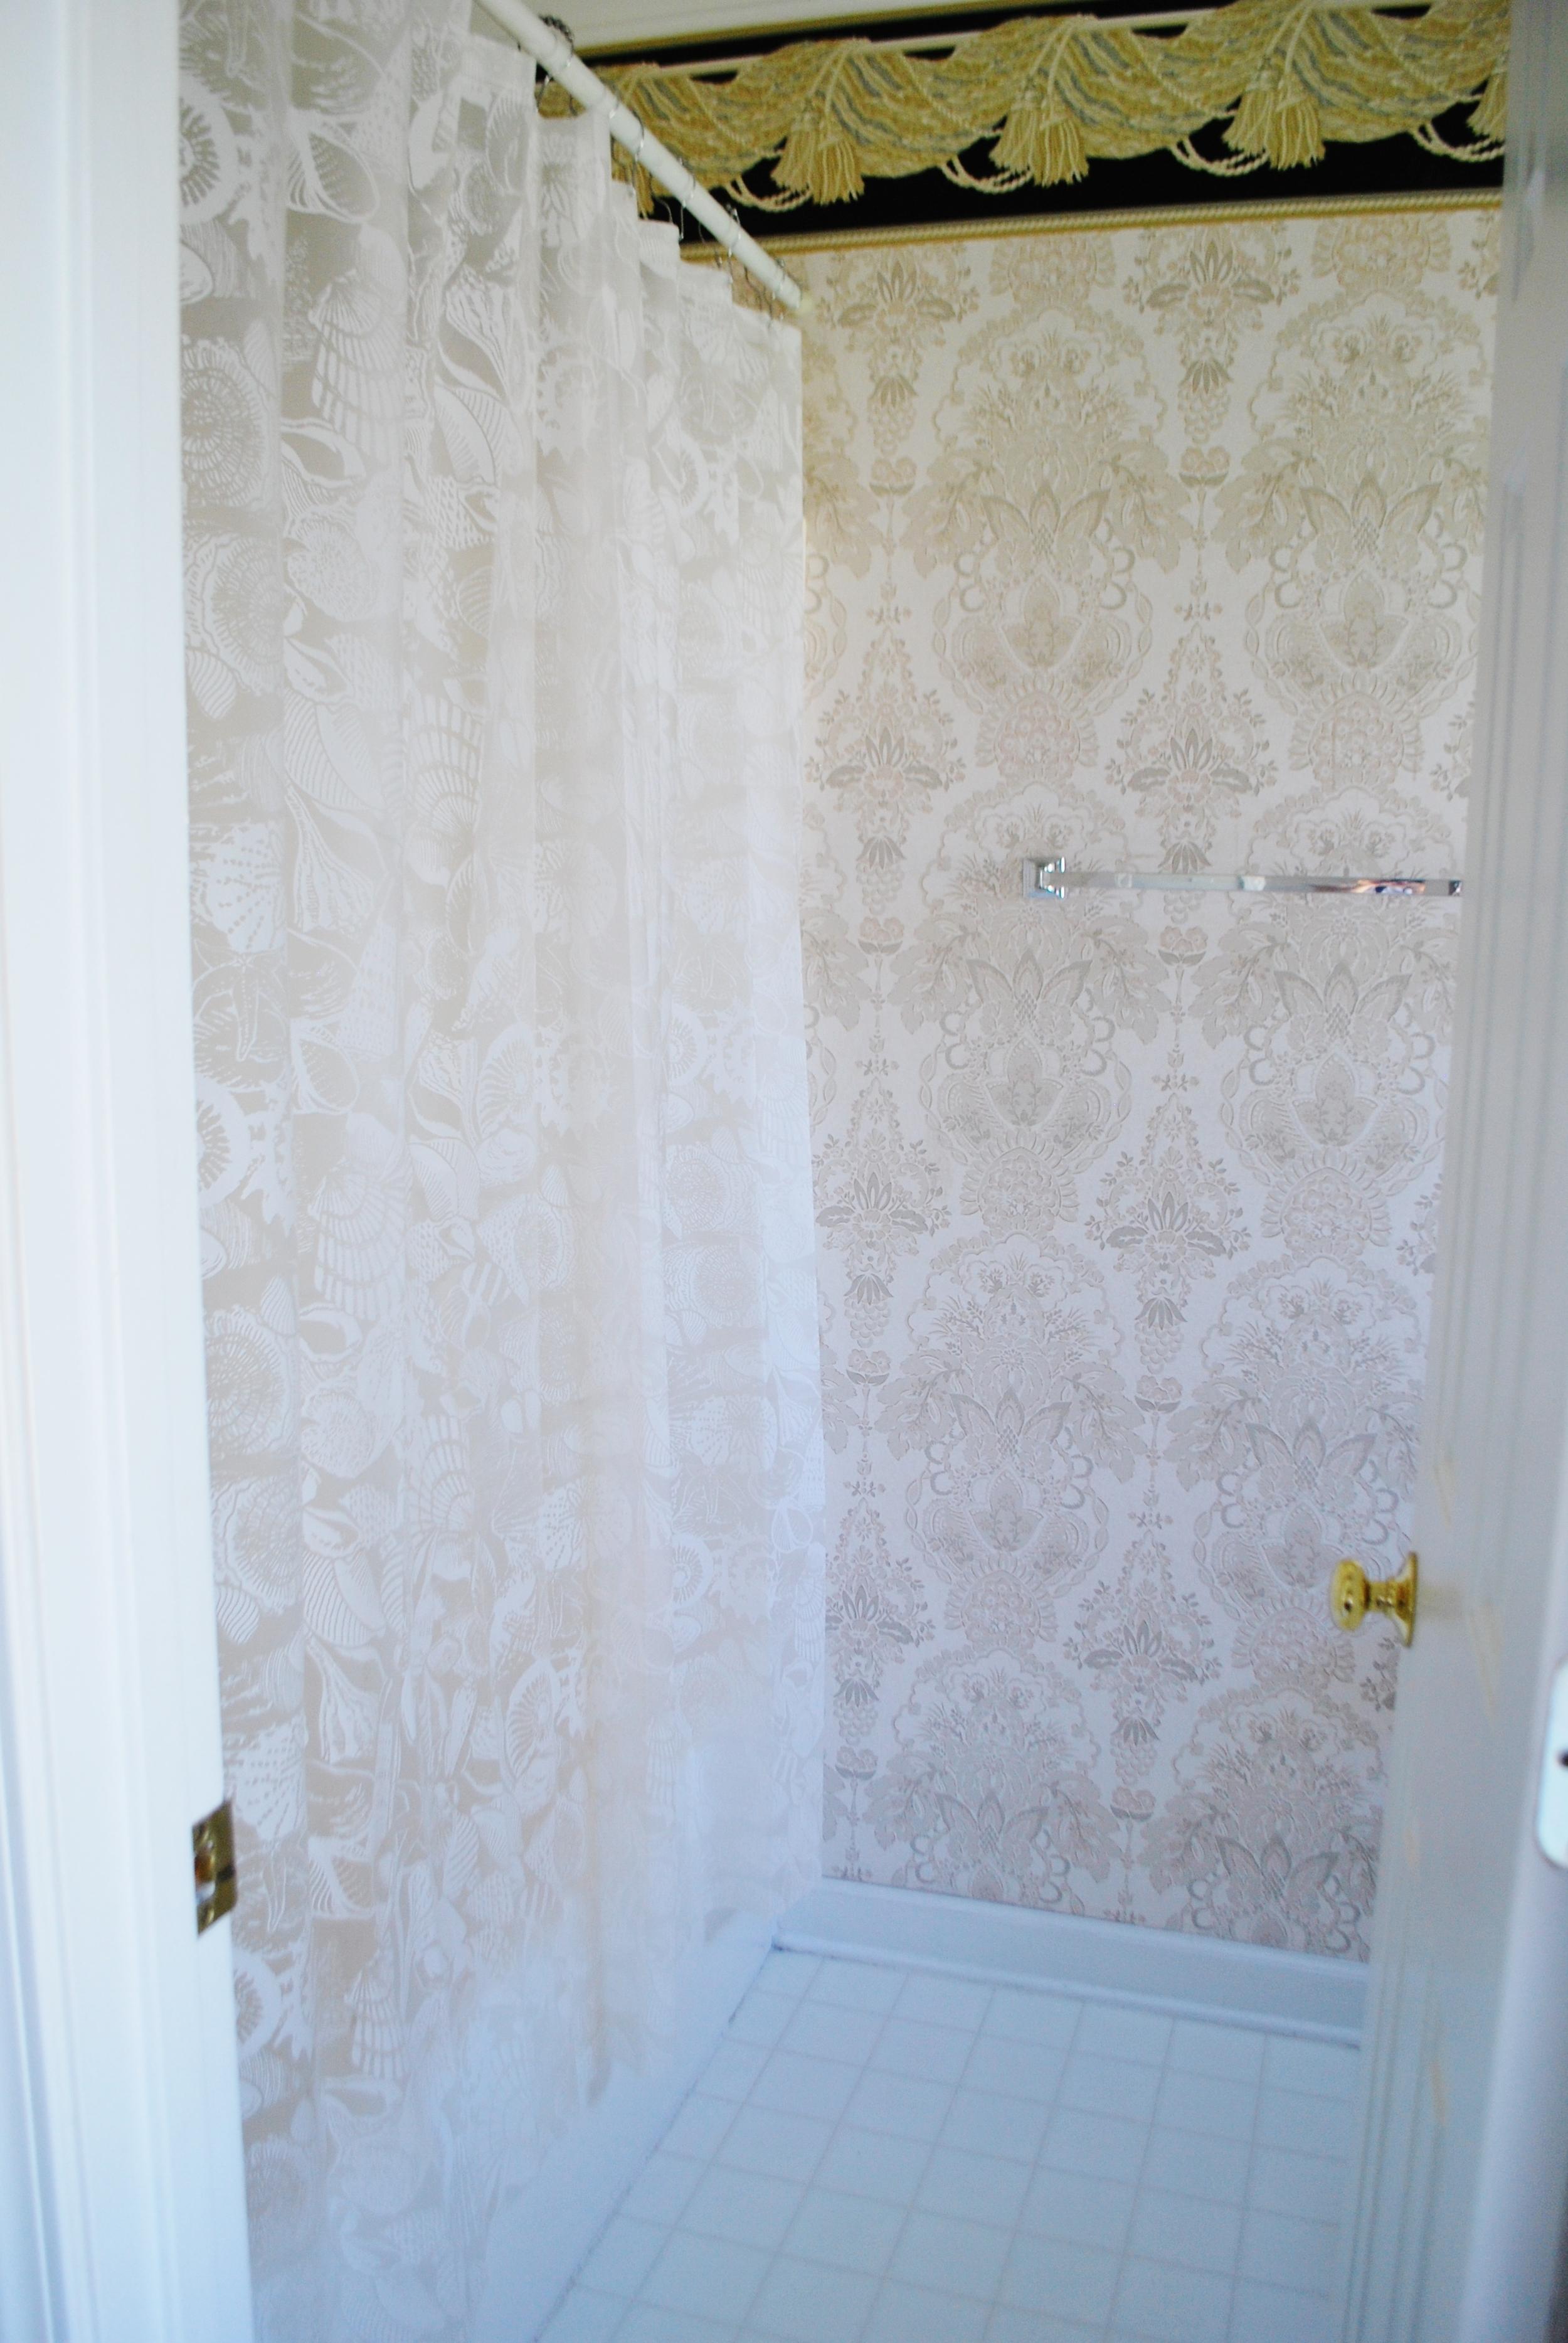 Shower/tub area